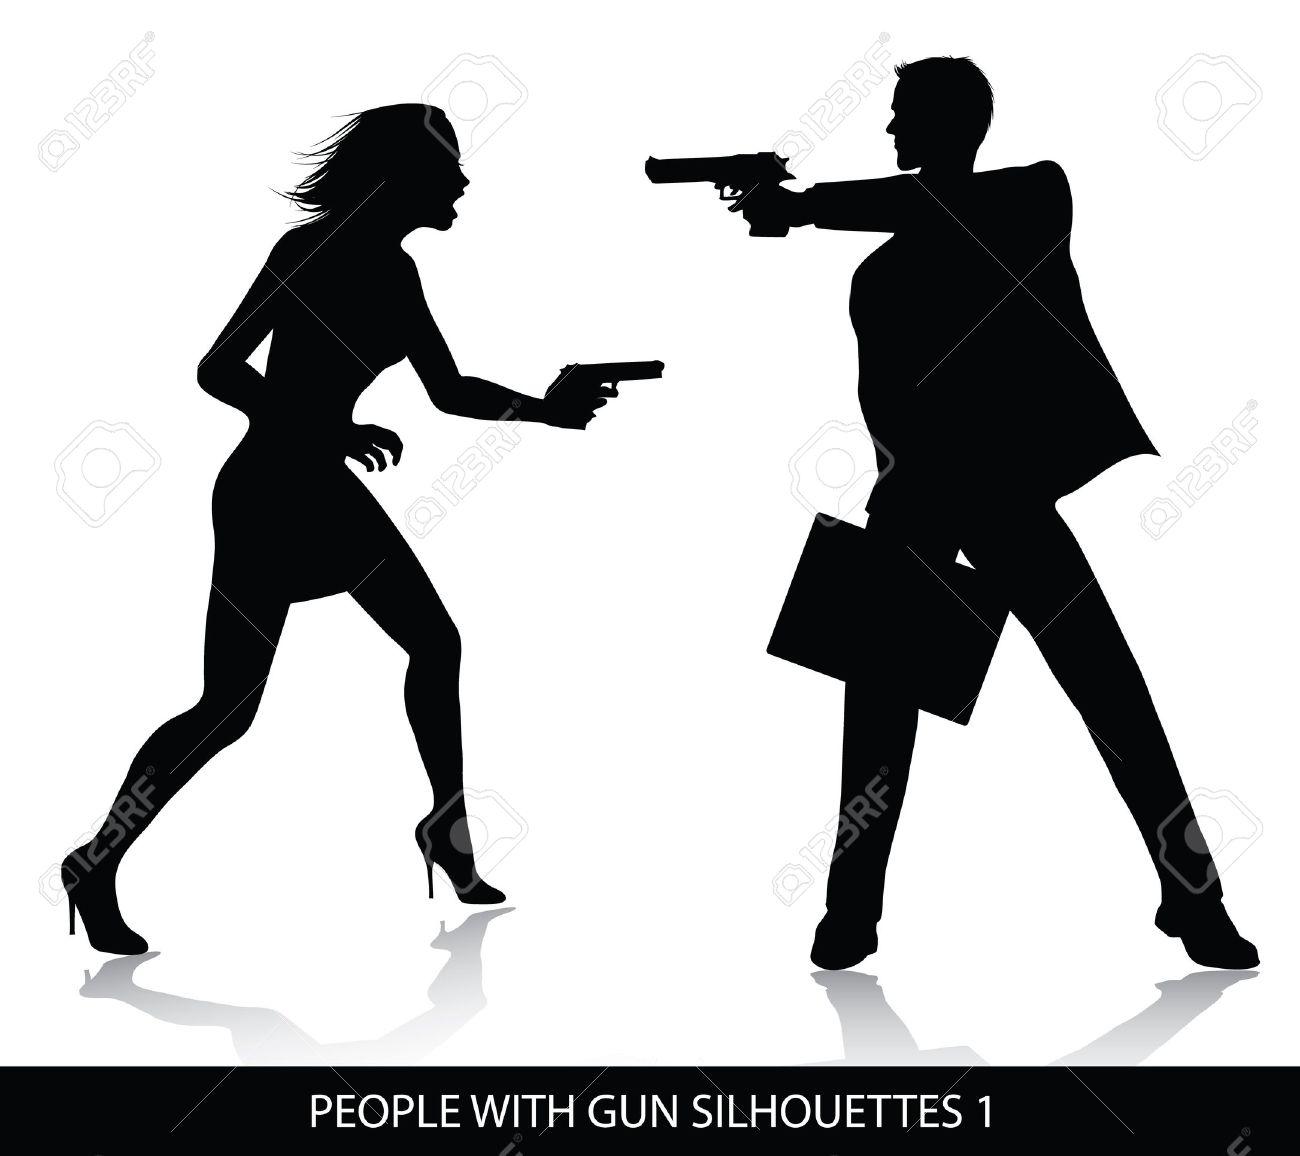 Murder silhouette clipart.